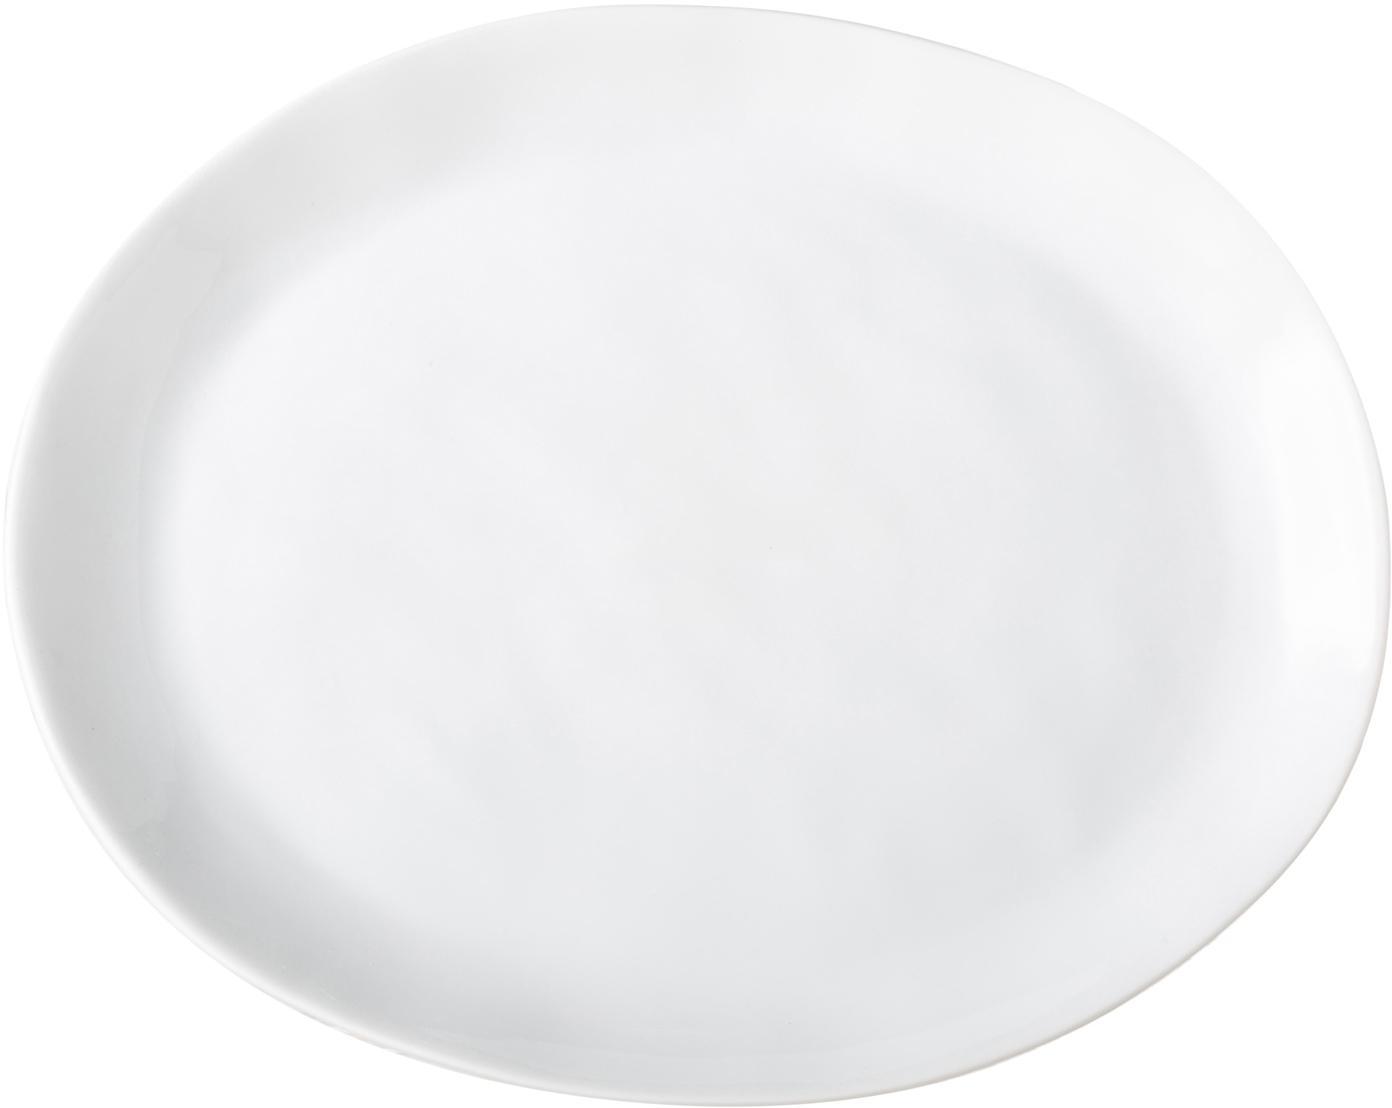 Piattino da dessert Porcelino 4 pz, Porcellana, volutamente irregolare, Bianco, Lung. 23 x Larg. 19 cm